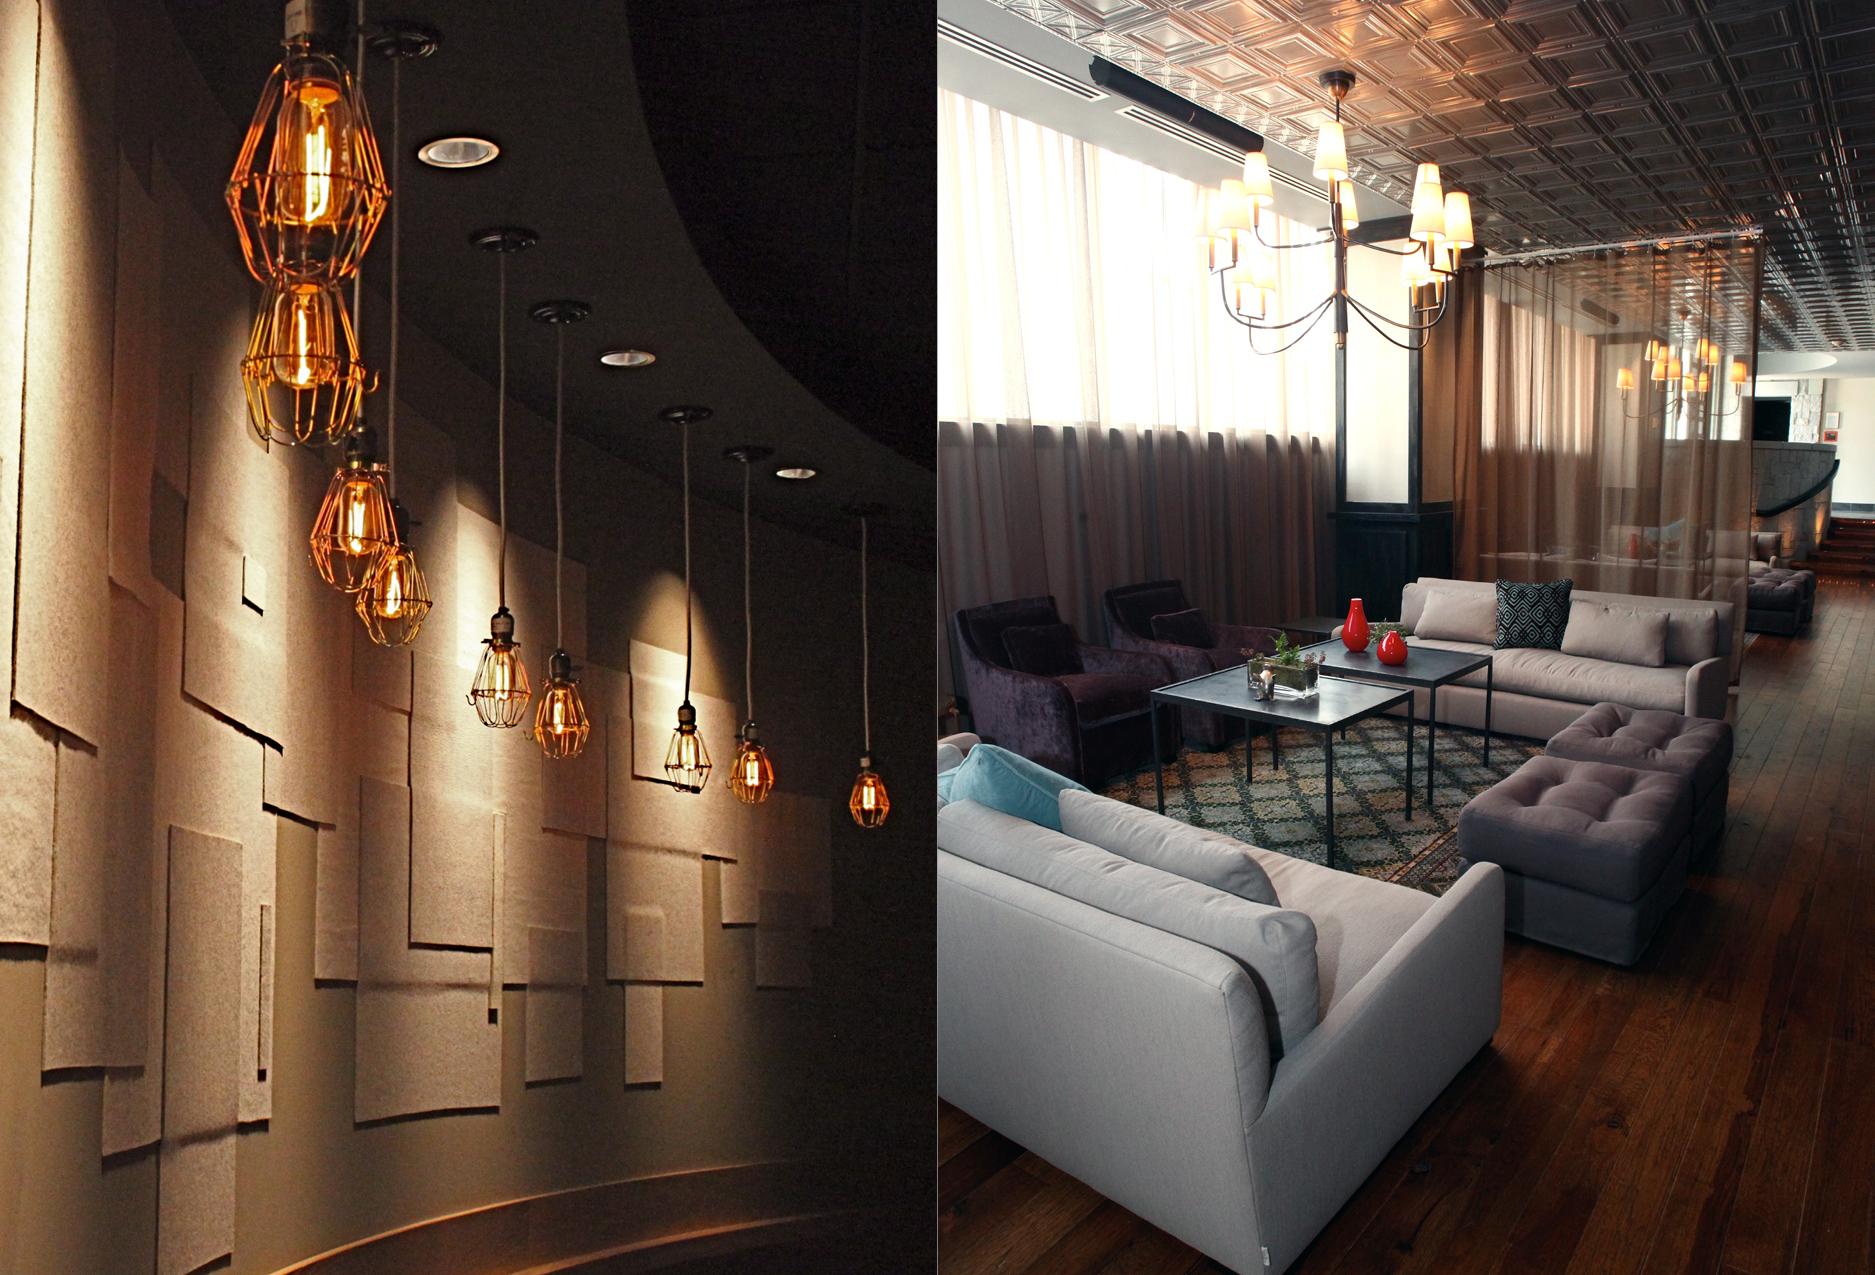 Interiors by Ellen Hanson Designs